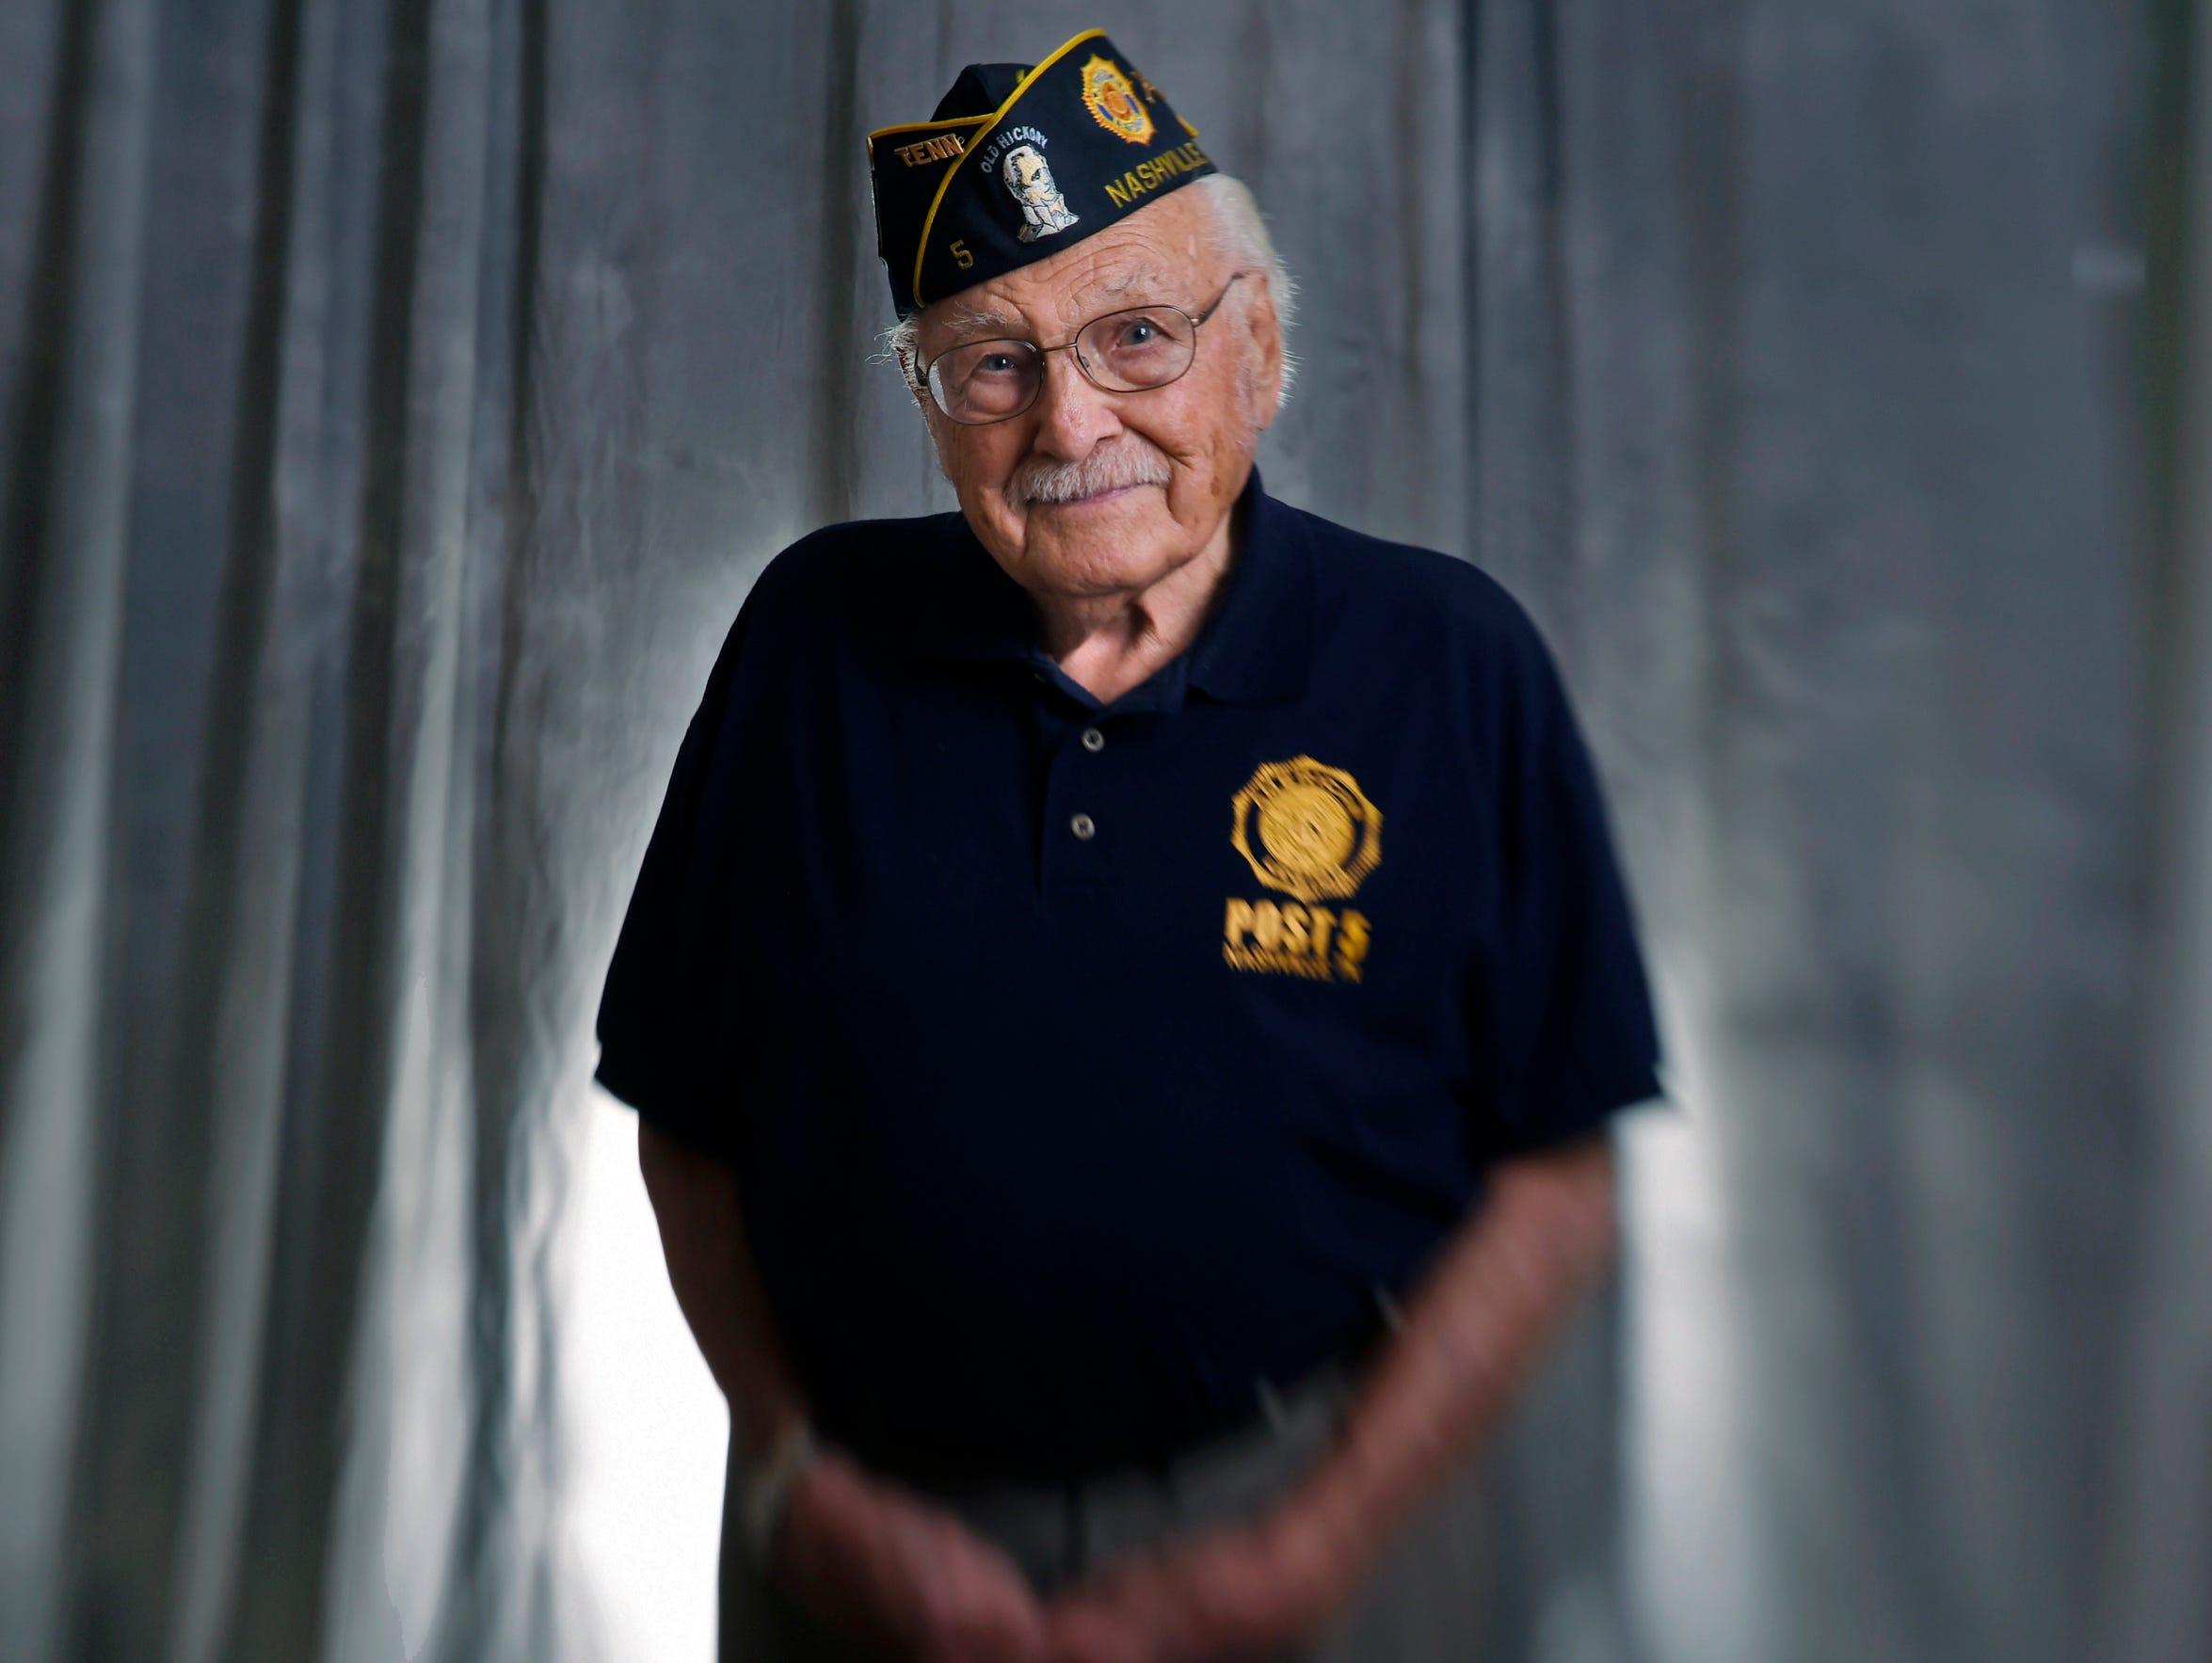 Em Ghianni is a World War II Army veteran. He was stationed